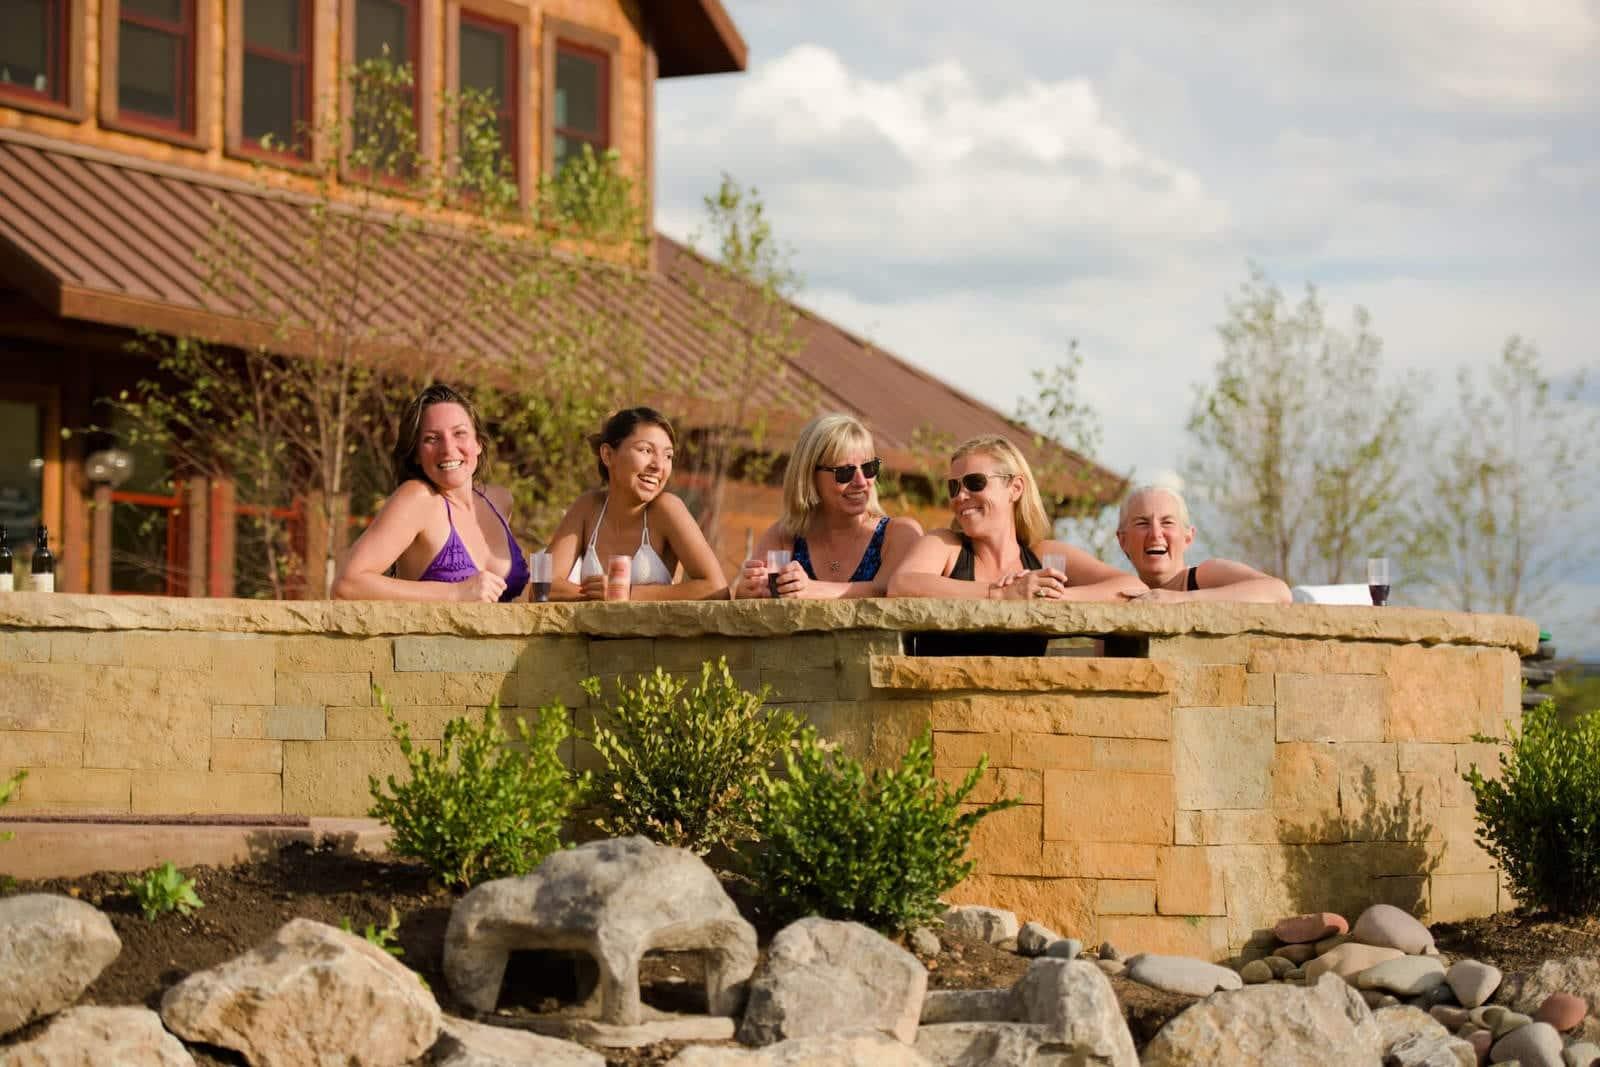 Iron Mountain Hot Springs Glenwood Springs Colorado Women in Pool